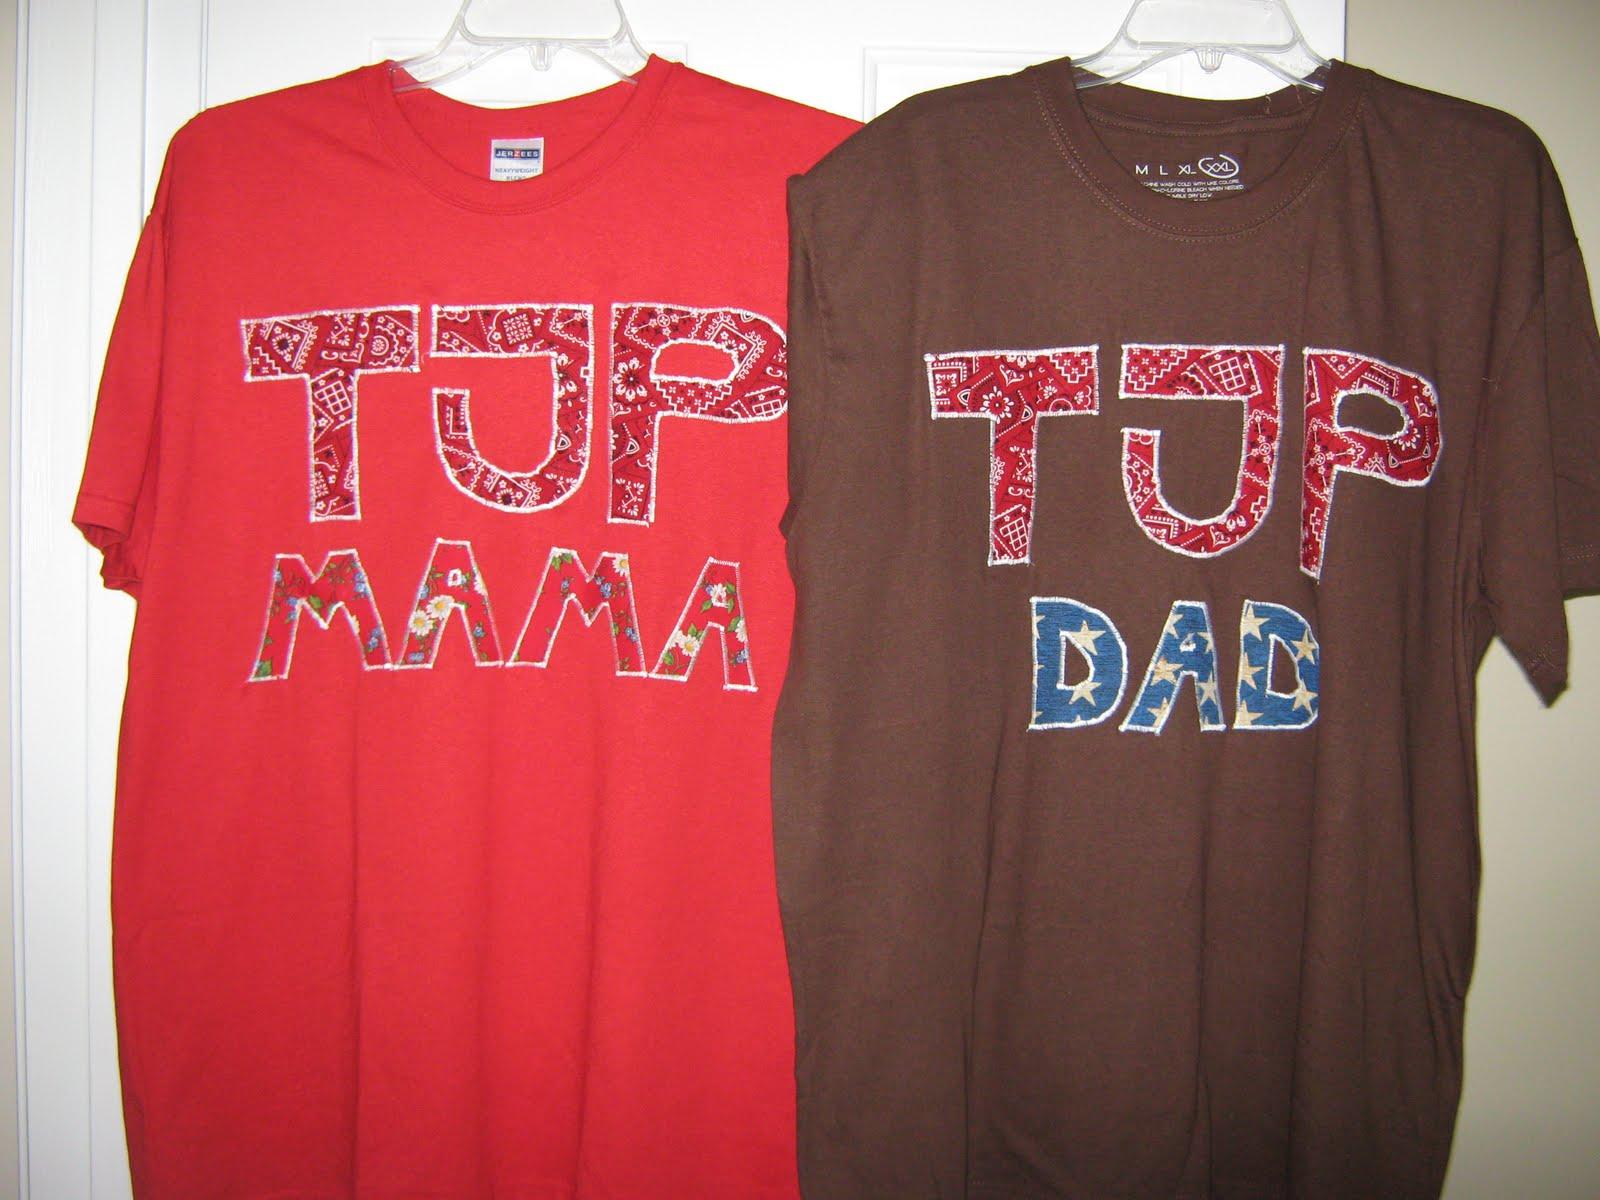 Fake it frugal alma mater shirts for Alma mater t shirts